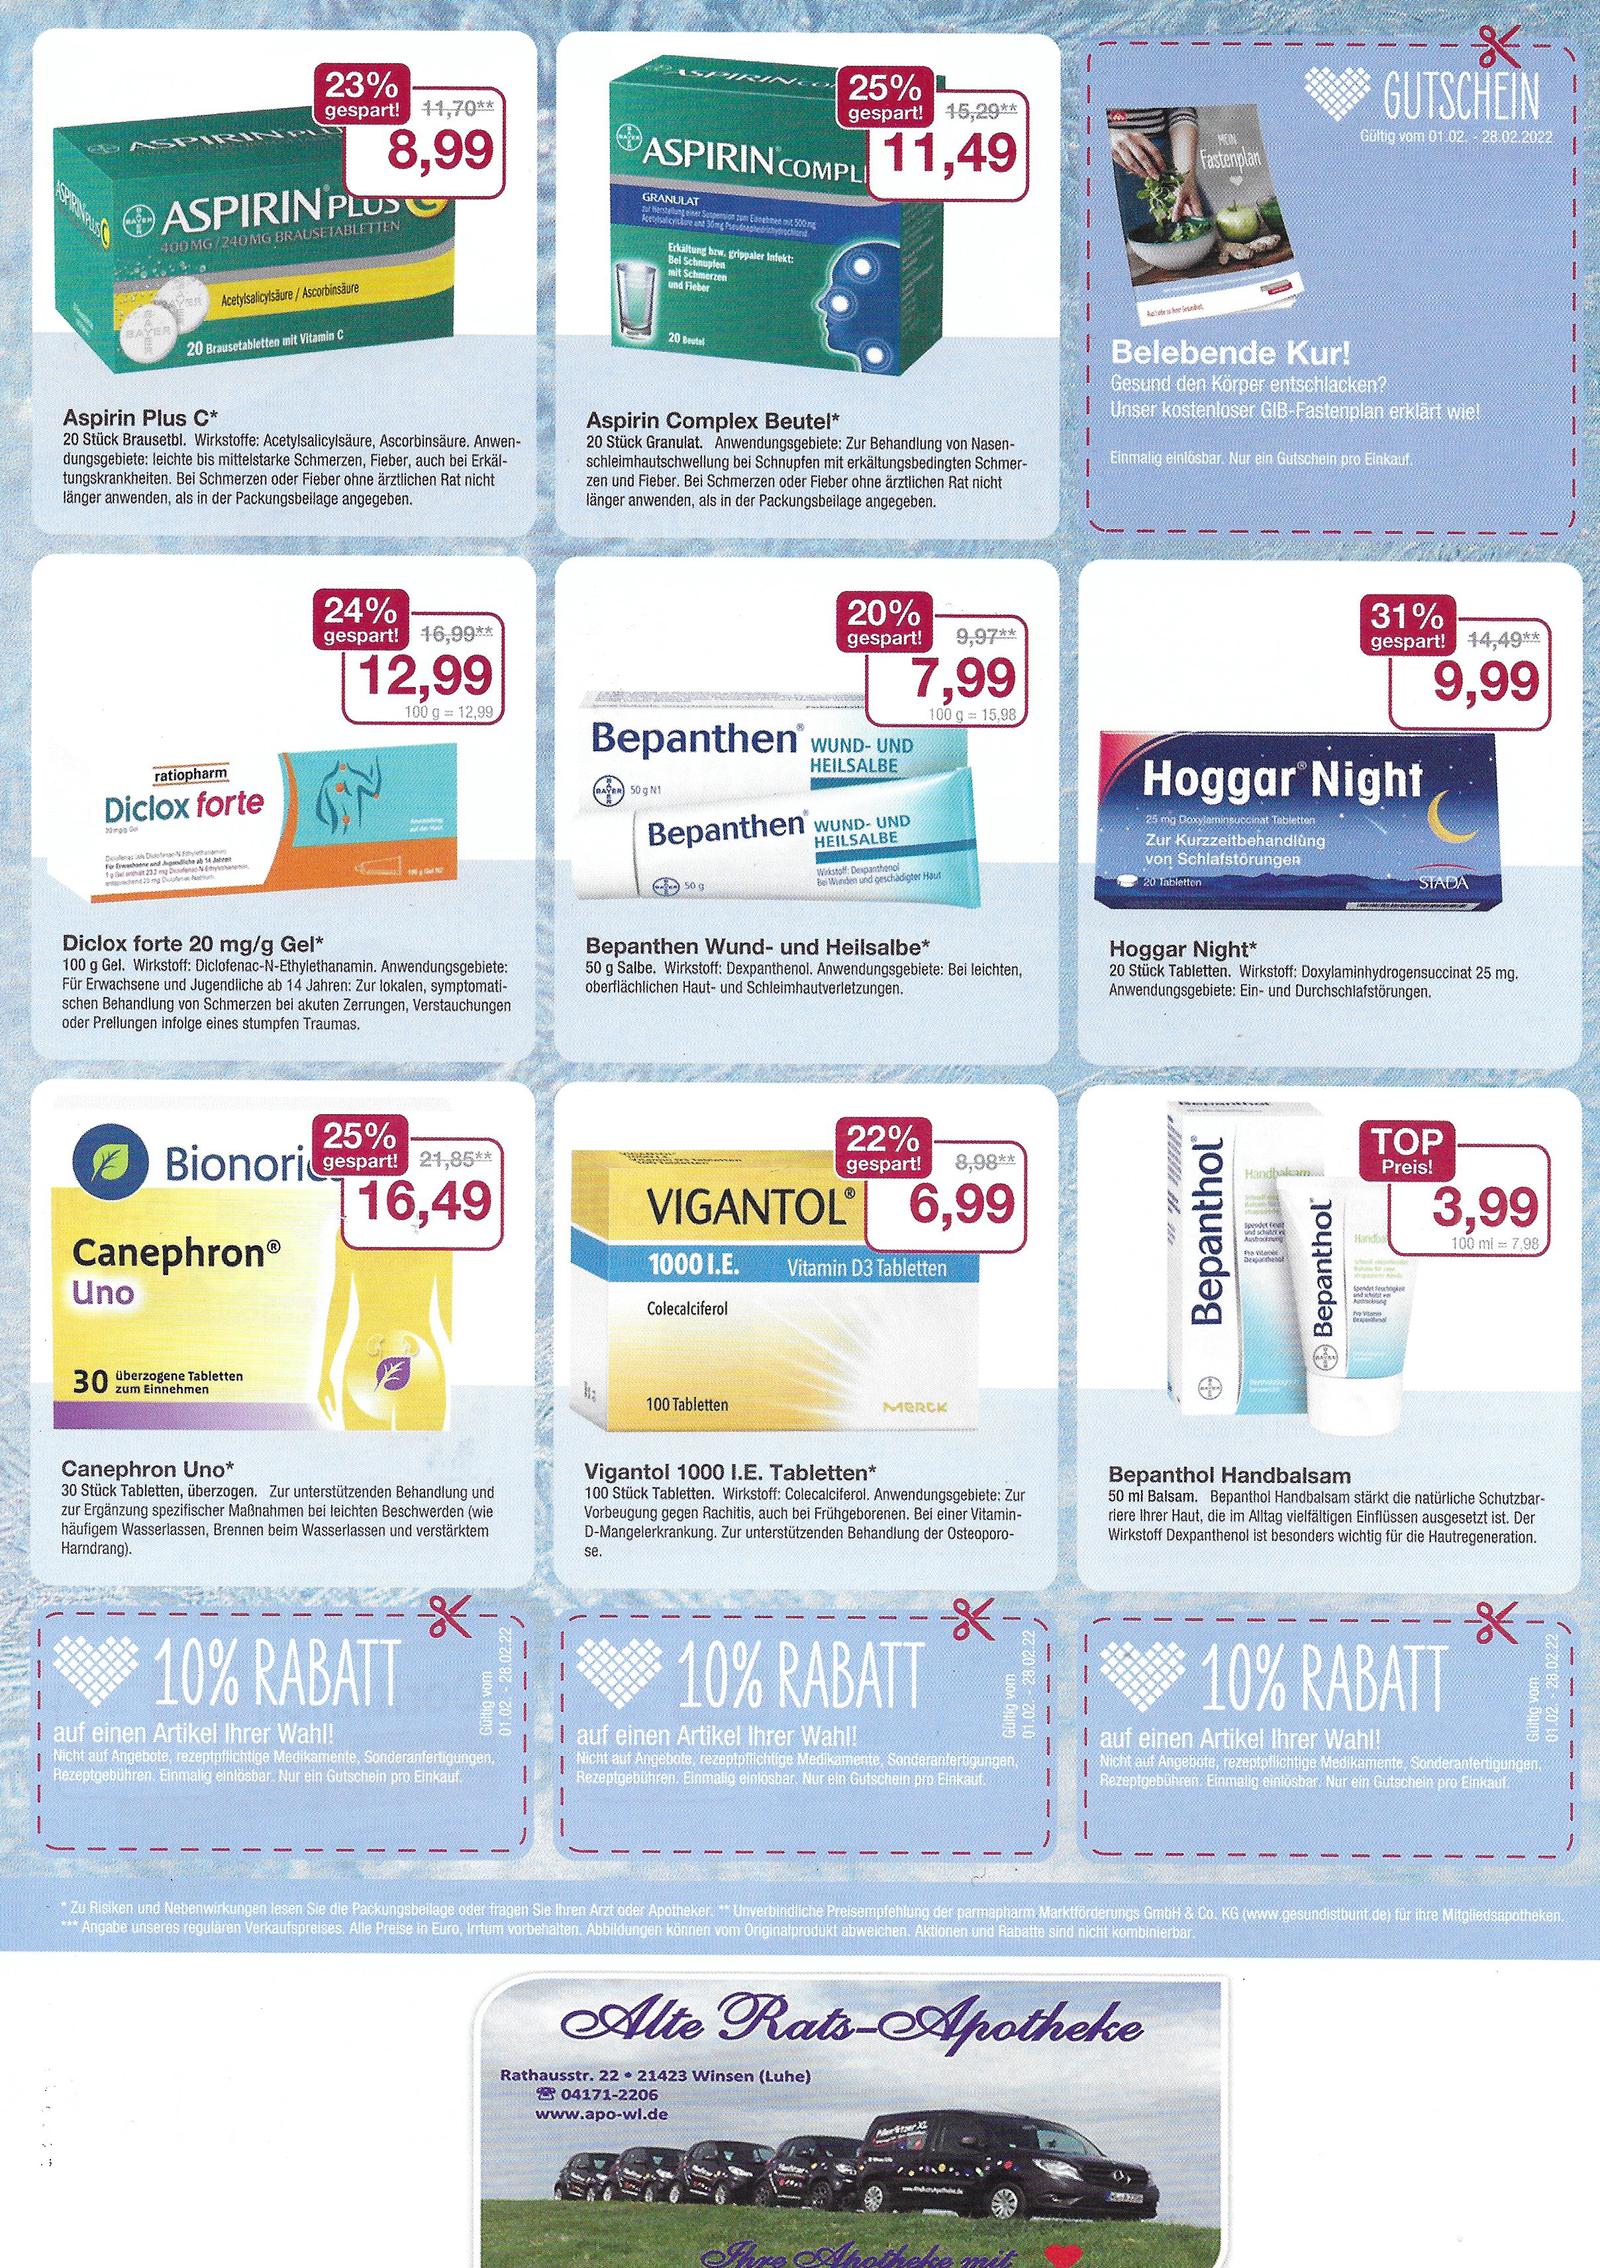 https://mein-uploads.apocdn.net/12734/leaflets/12734_flyer-Seite2.png